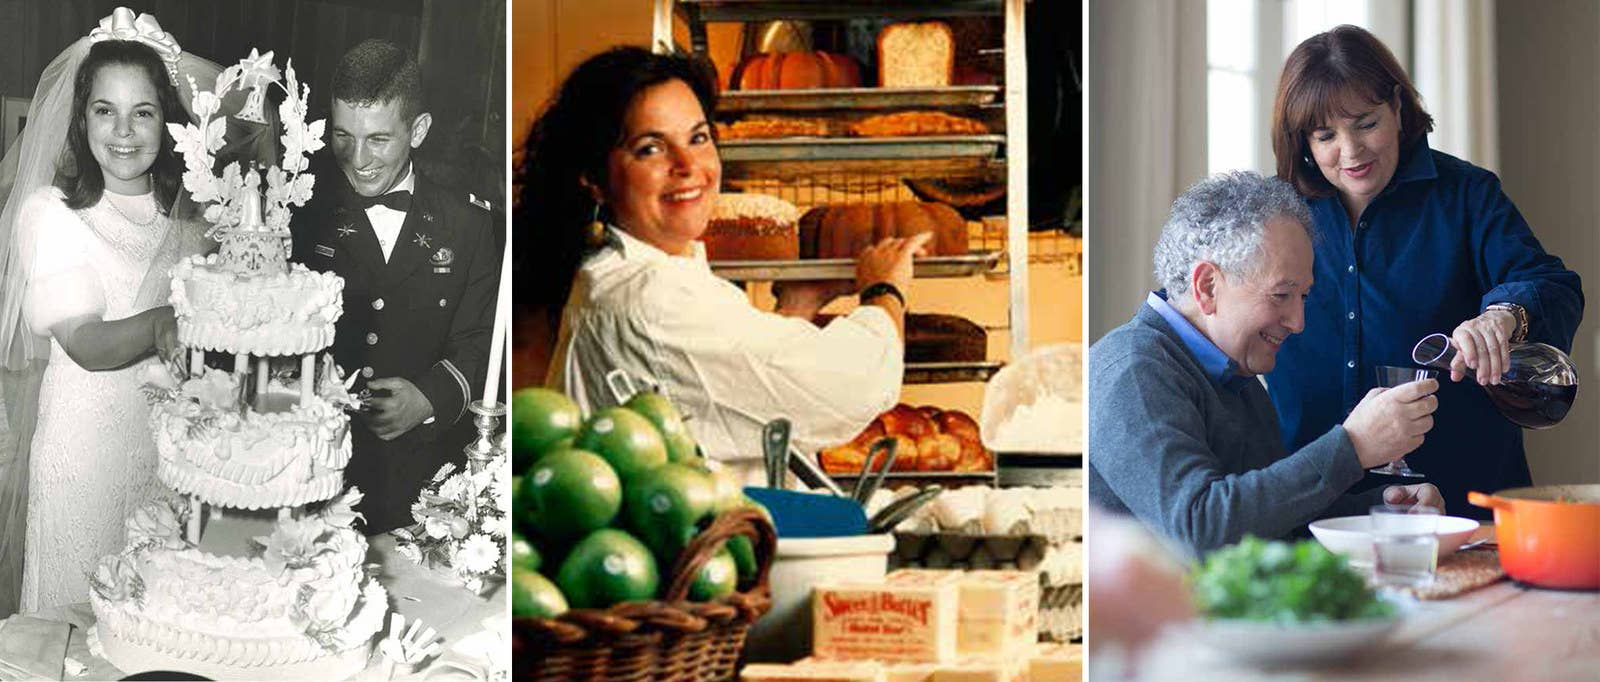 Delectable 25 Inagarten Design Ideas Of Tips Recipes And